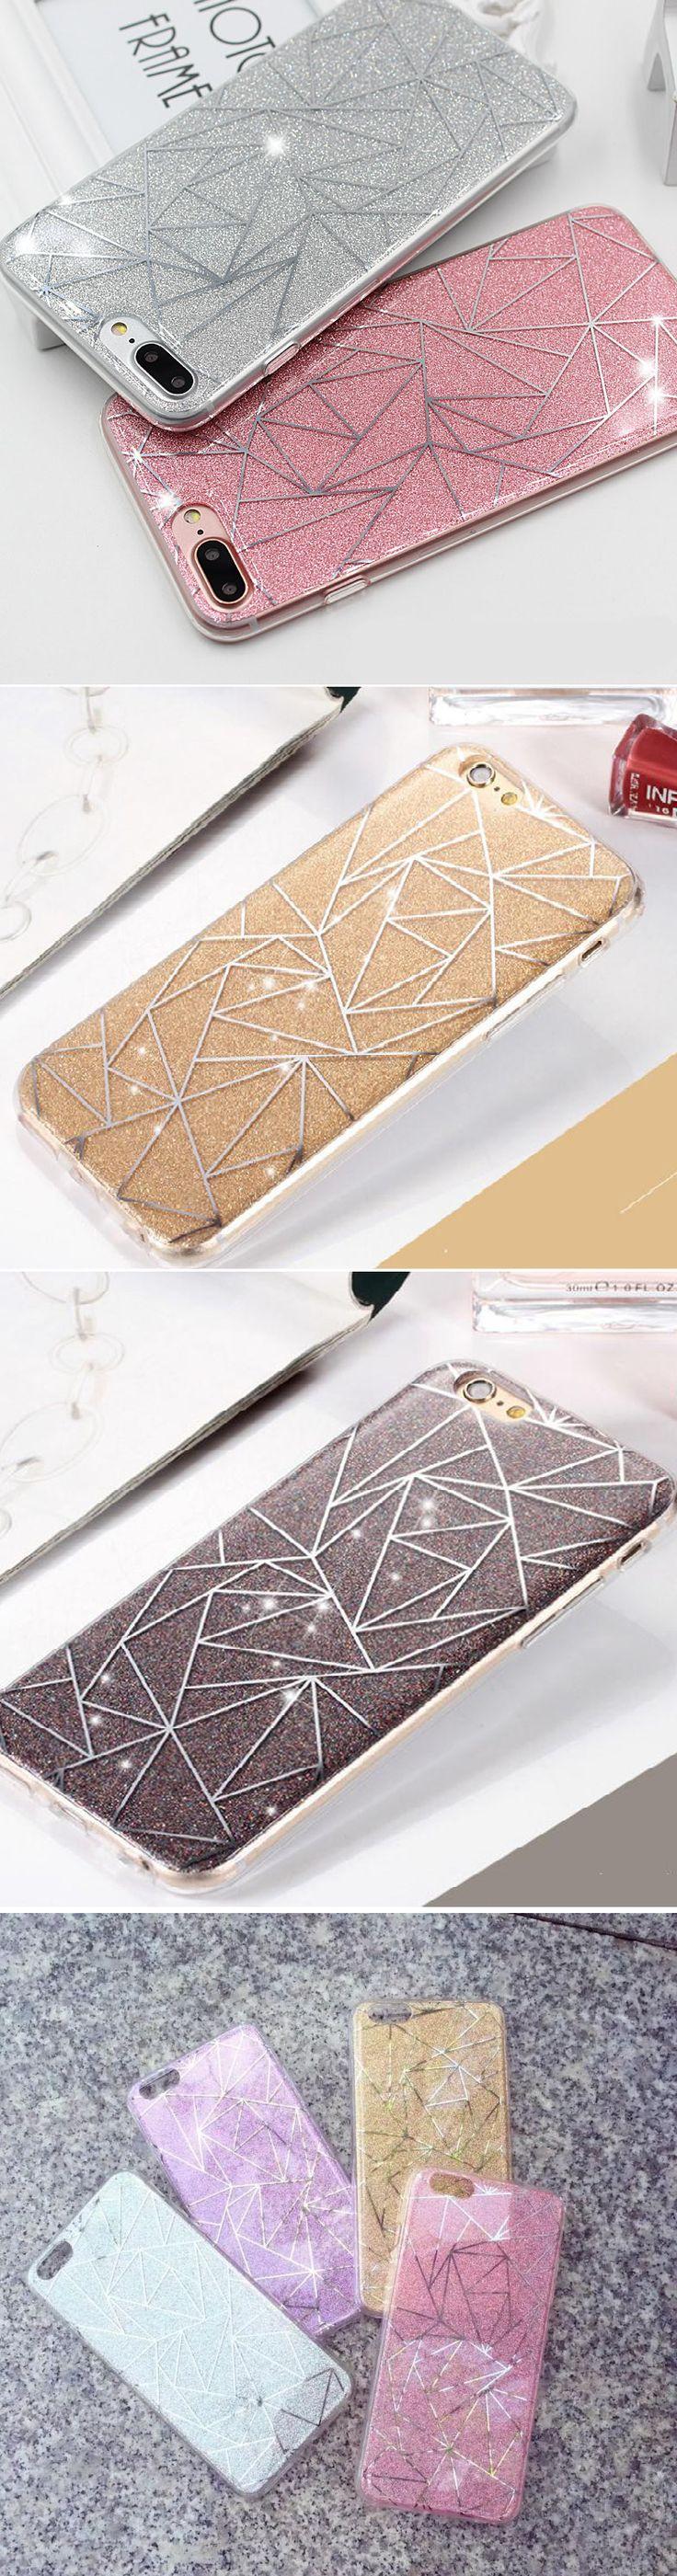 Stylish Glitter iPhone Case